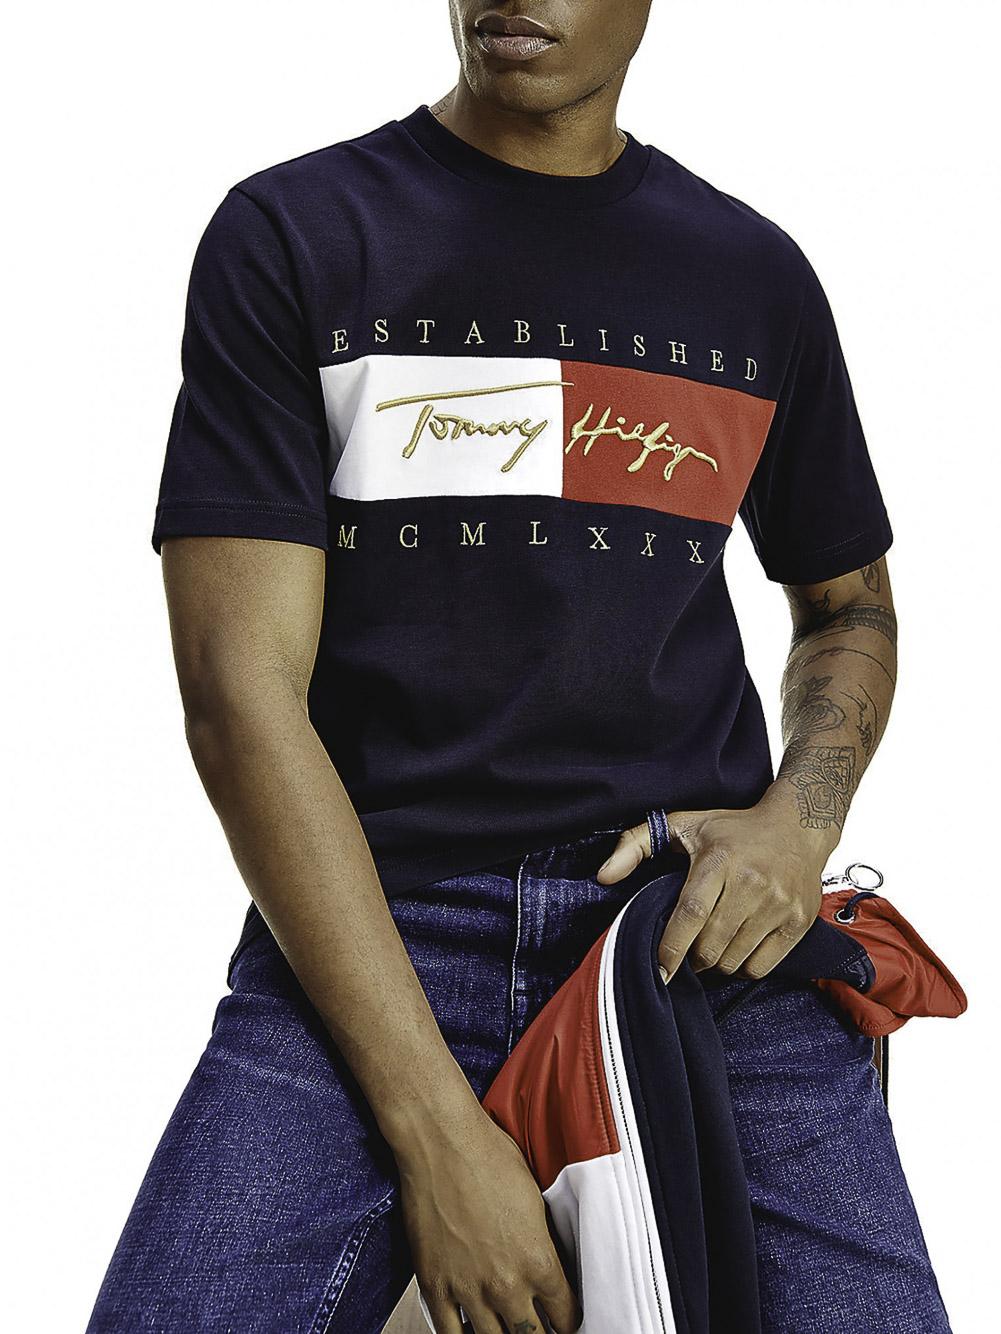 TOMMY HILFIGER Μπλούζα t-shirt MW0MW16598 ΜΠΛΕ